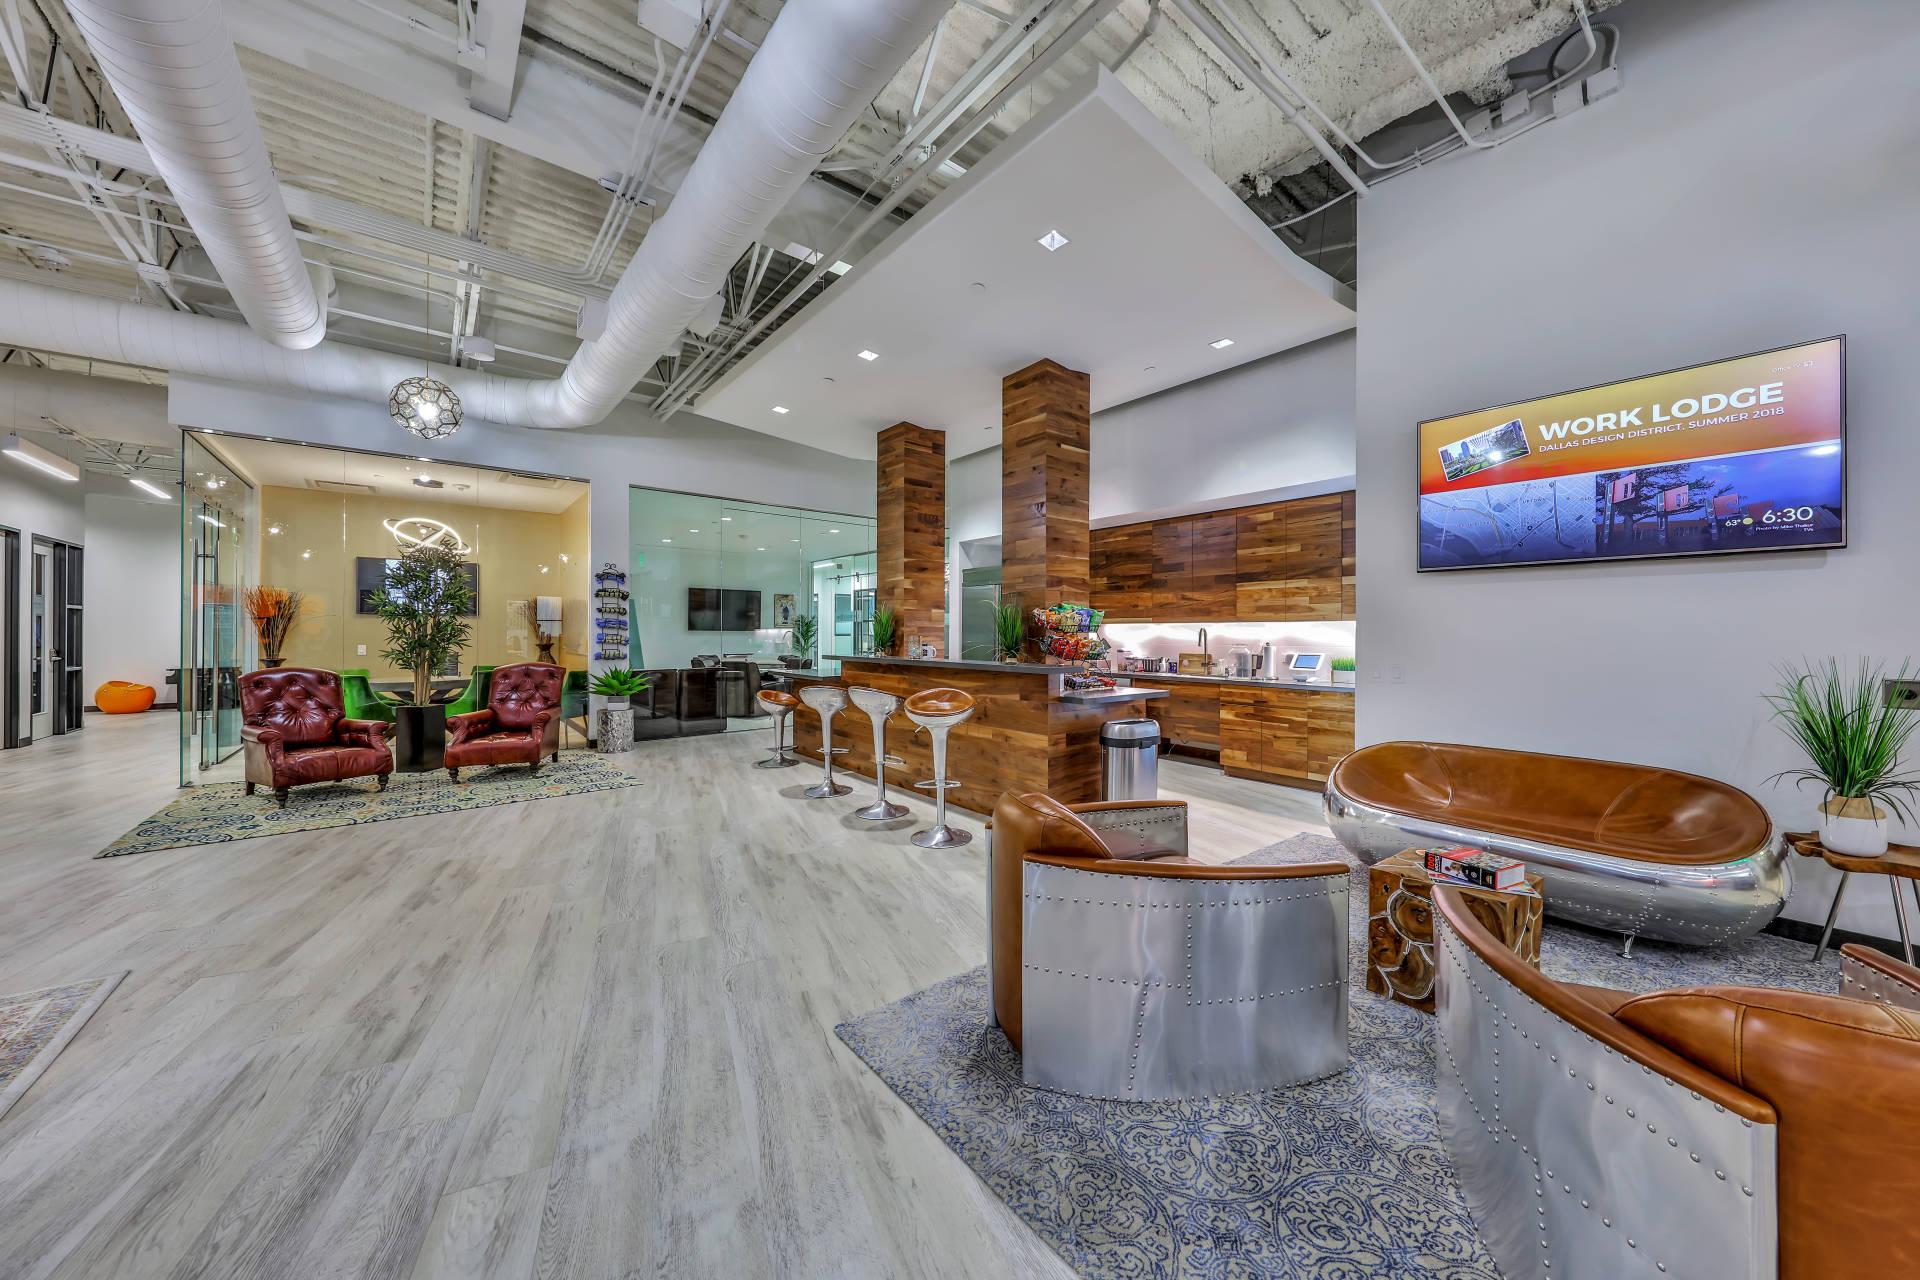 The Work Lodge, Houston